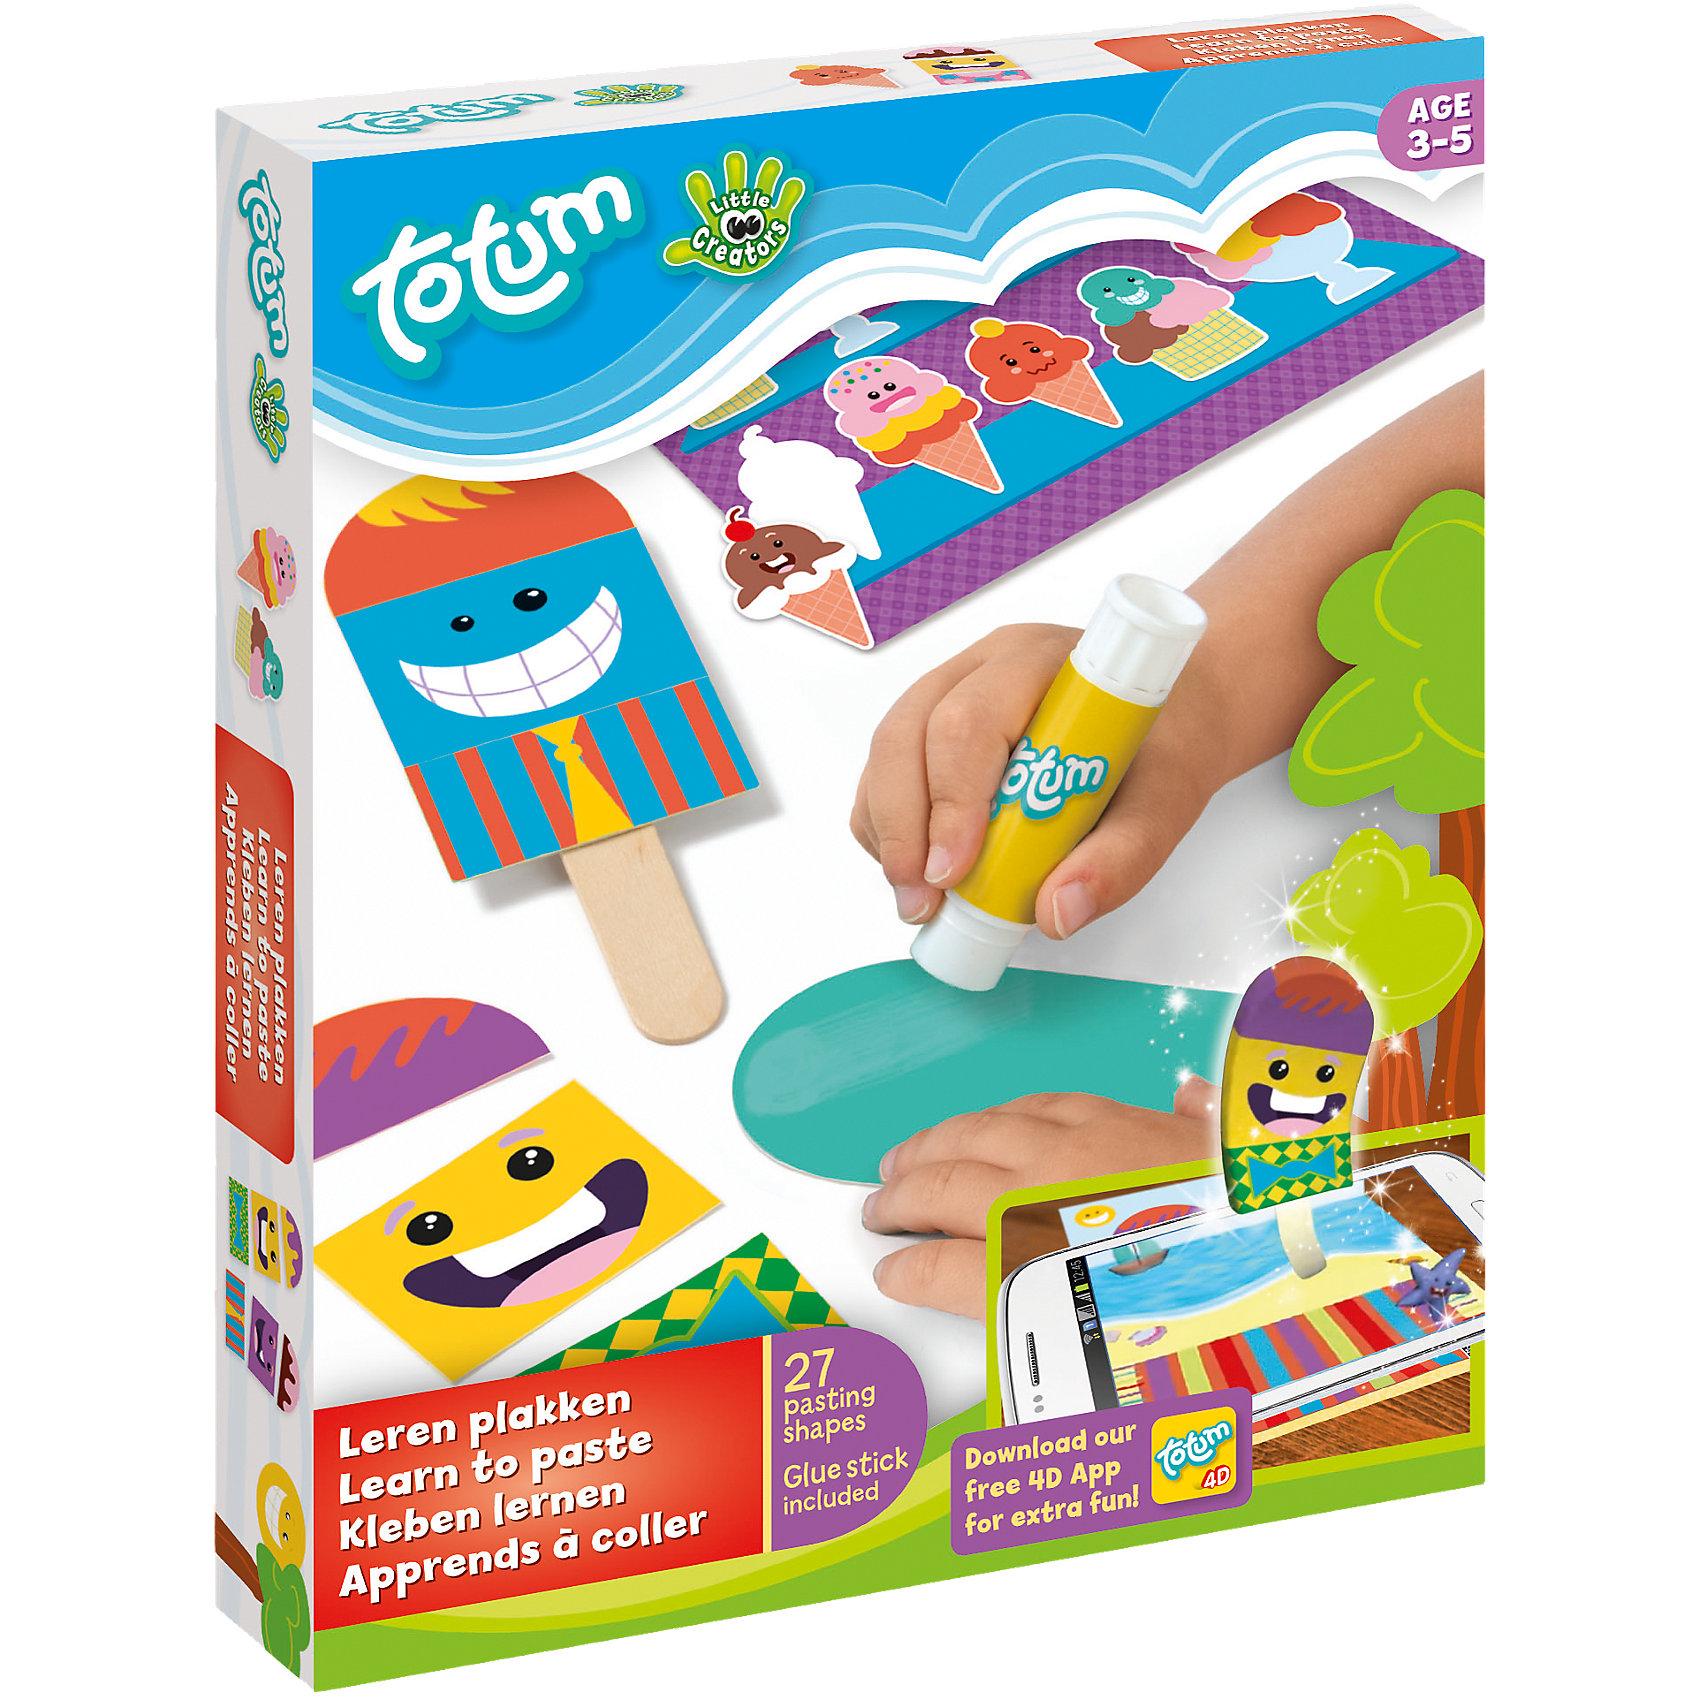 TOTUM Набор для творчества LITTLE CREATORS Учимся клеить totum набор для творчества little creators учимся клеить